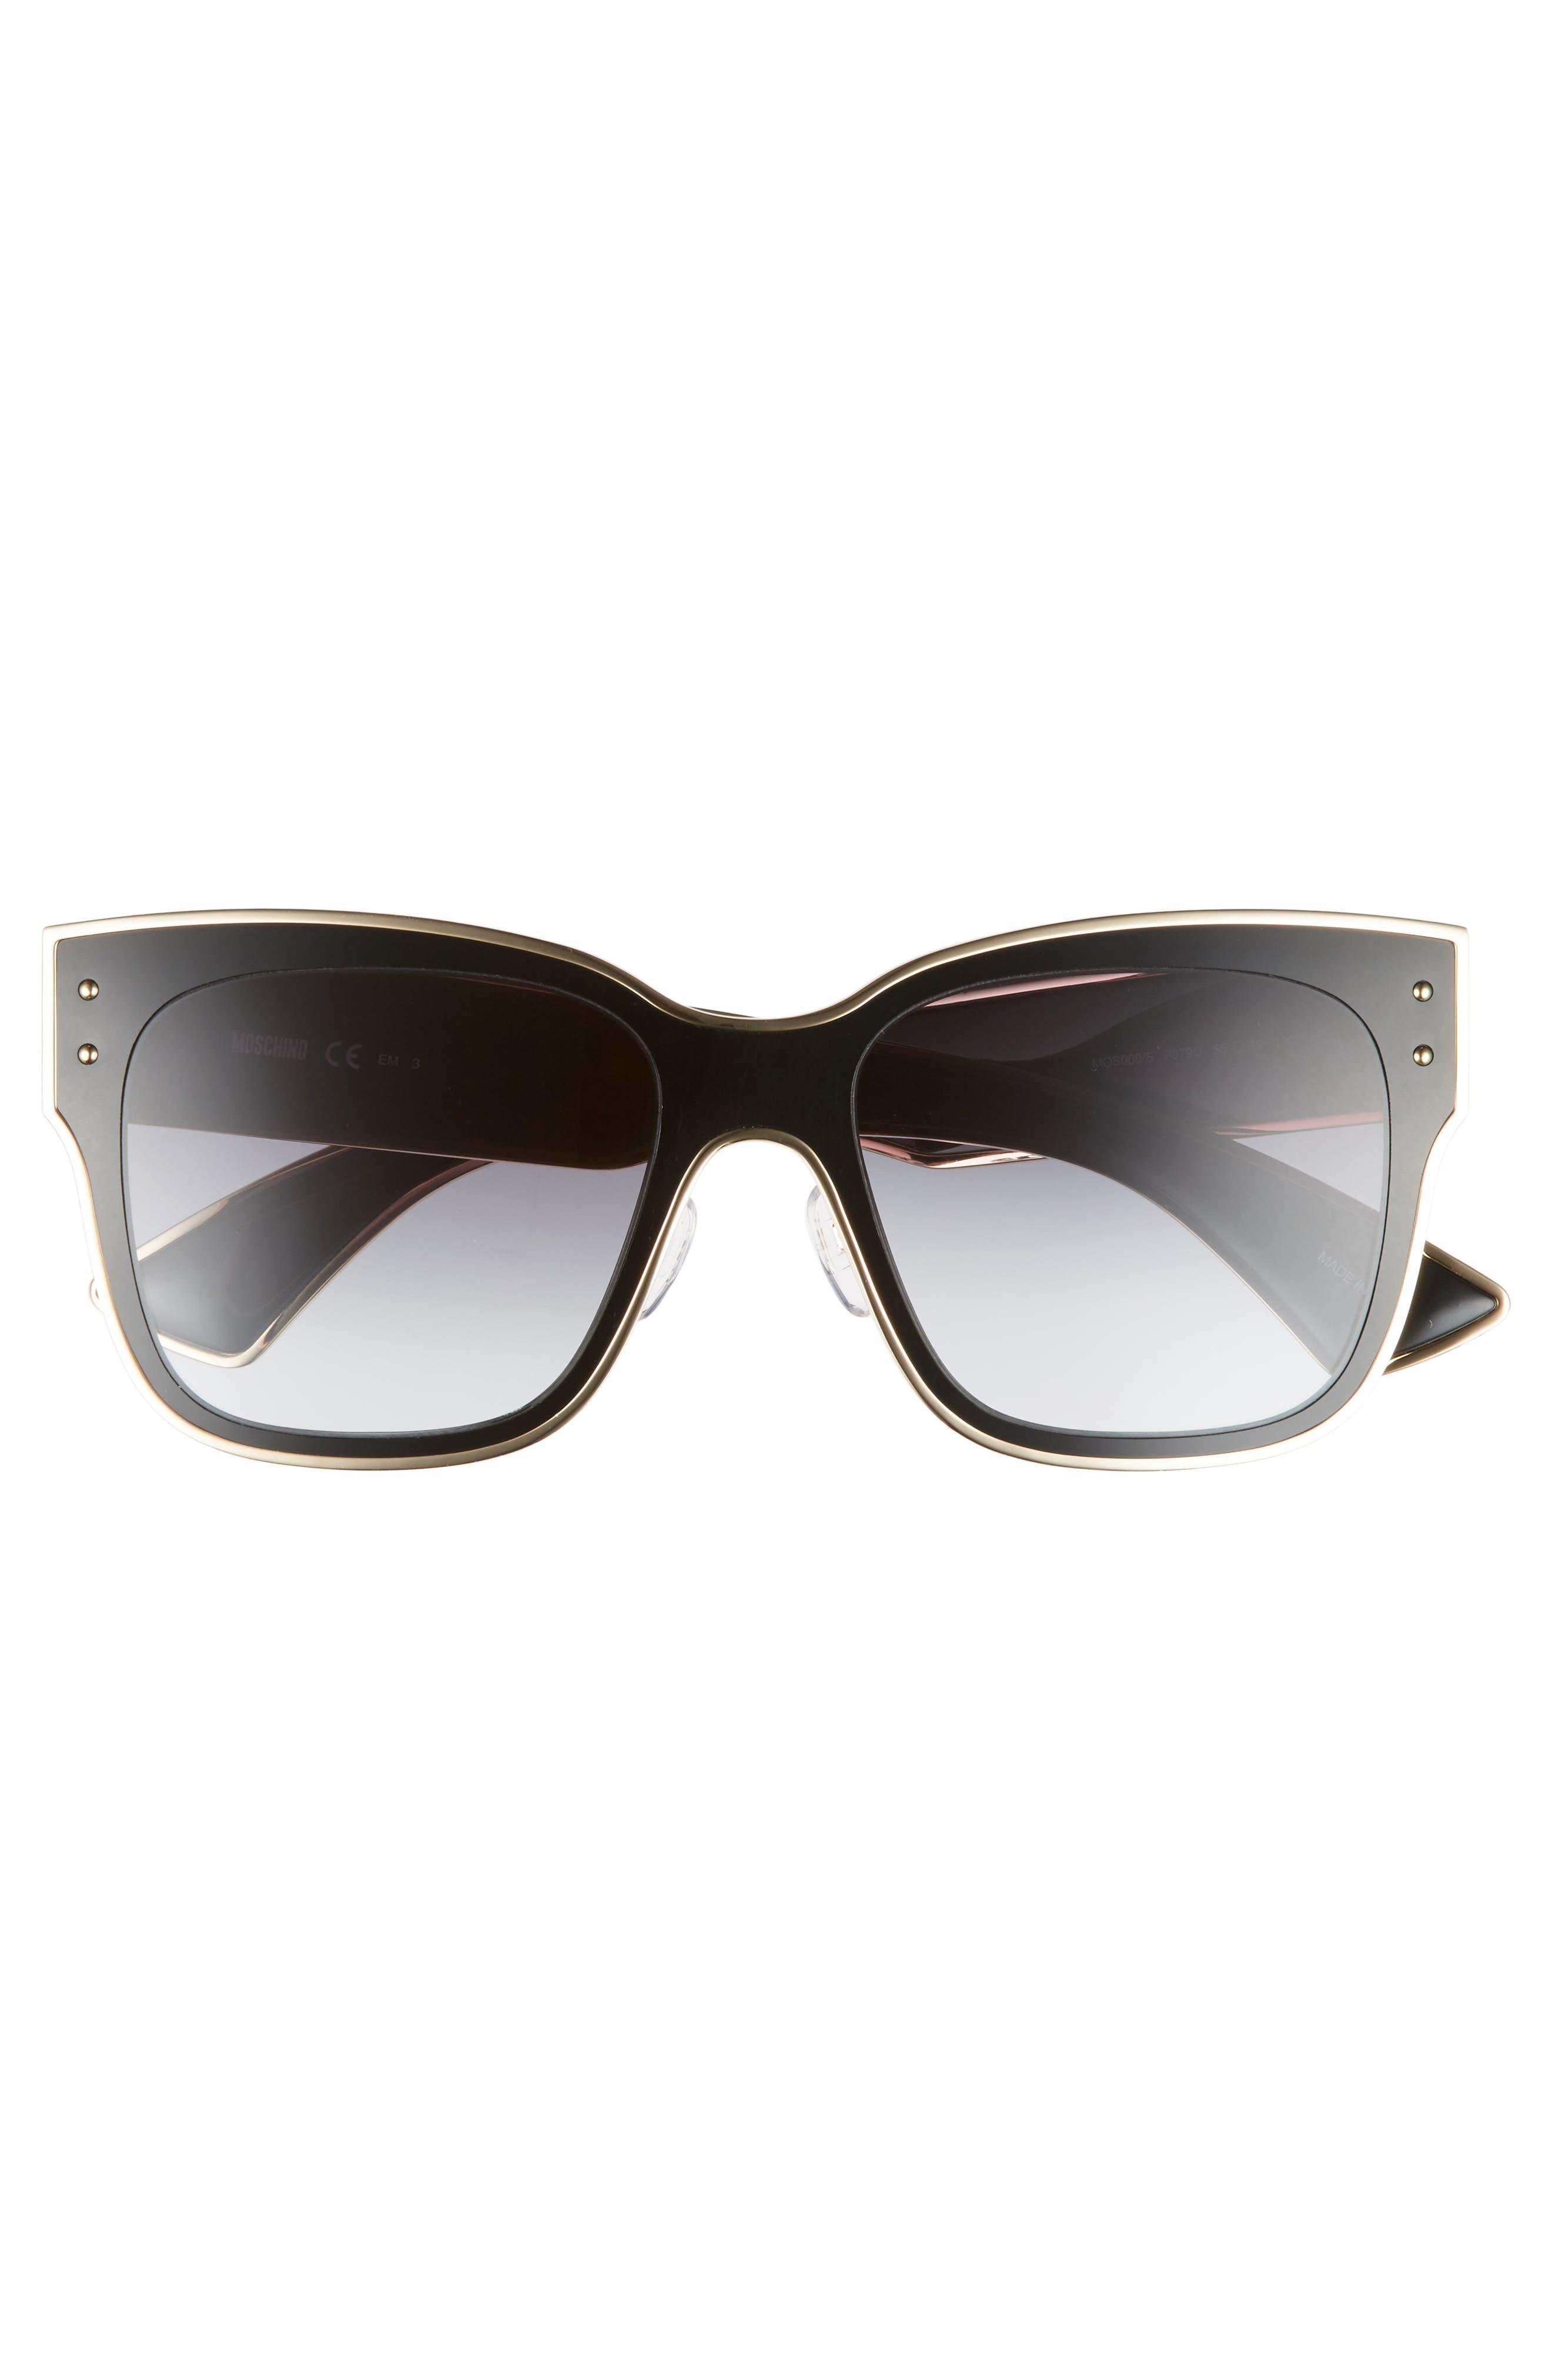 55mm Cat Eye Sunglasses,                             Alternate thumbnail 3, color,                             BLACK